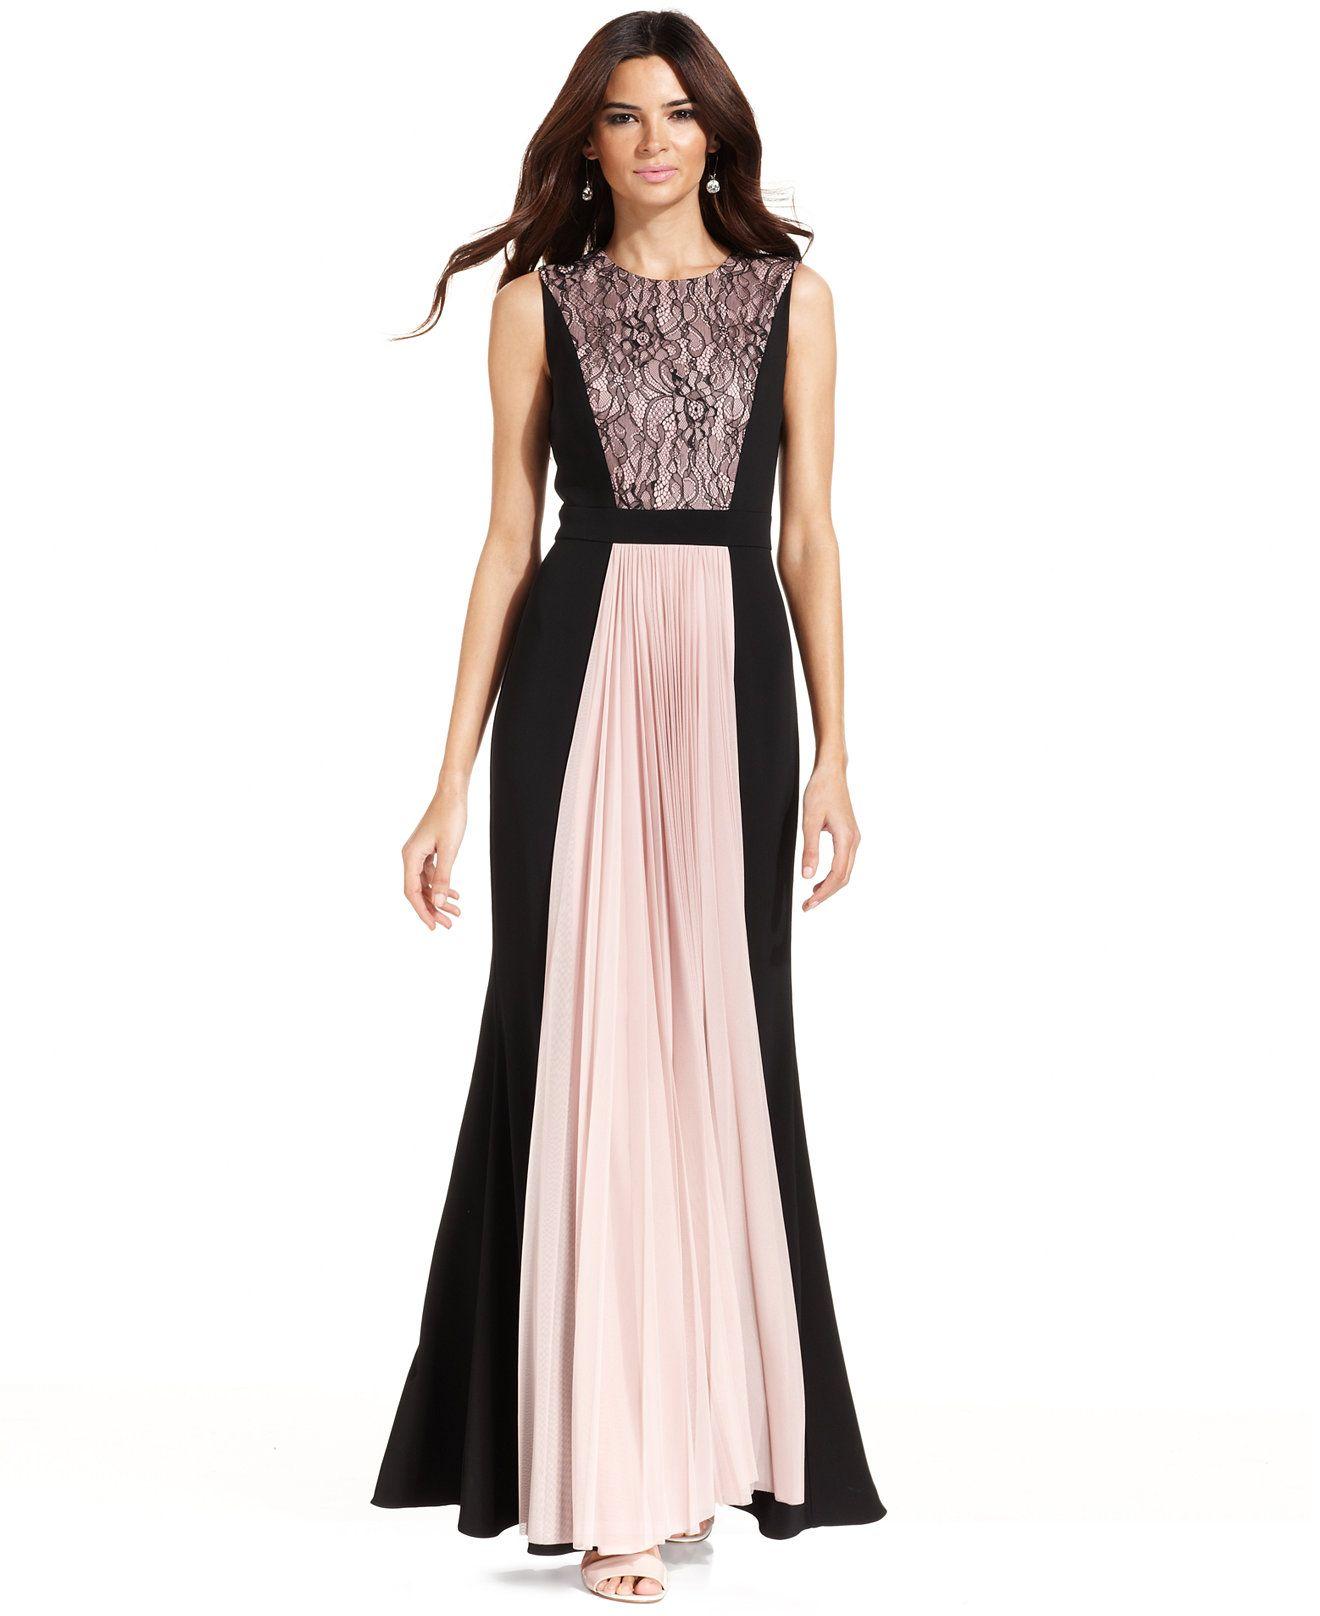 JS Collections Contrast Lace-Panel Pleat Gown - Dresses - Women ...